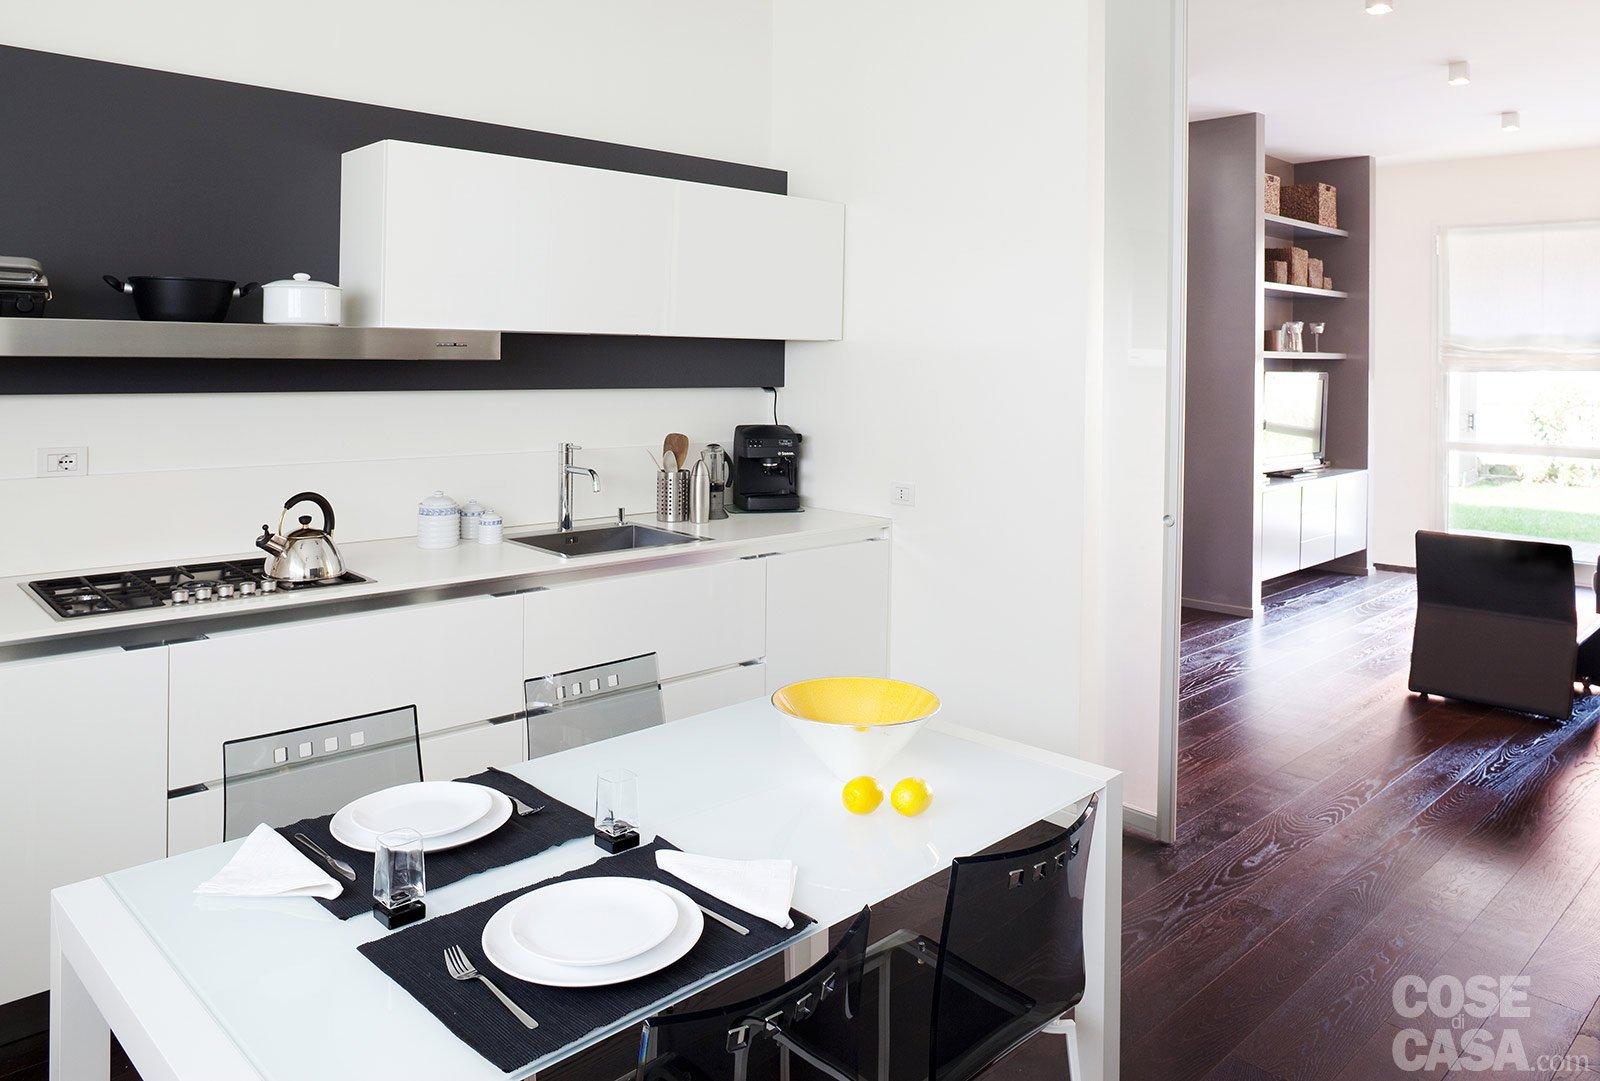 Una casa ristrutturata puntando sull 39 efficienza energetica for Case ristrutturate moderne